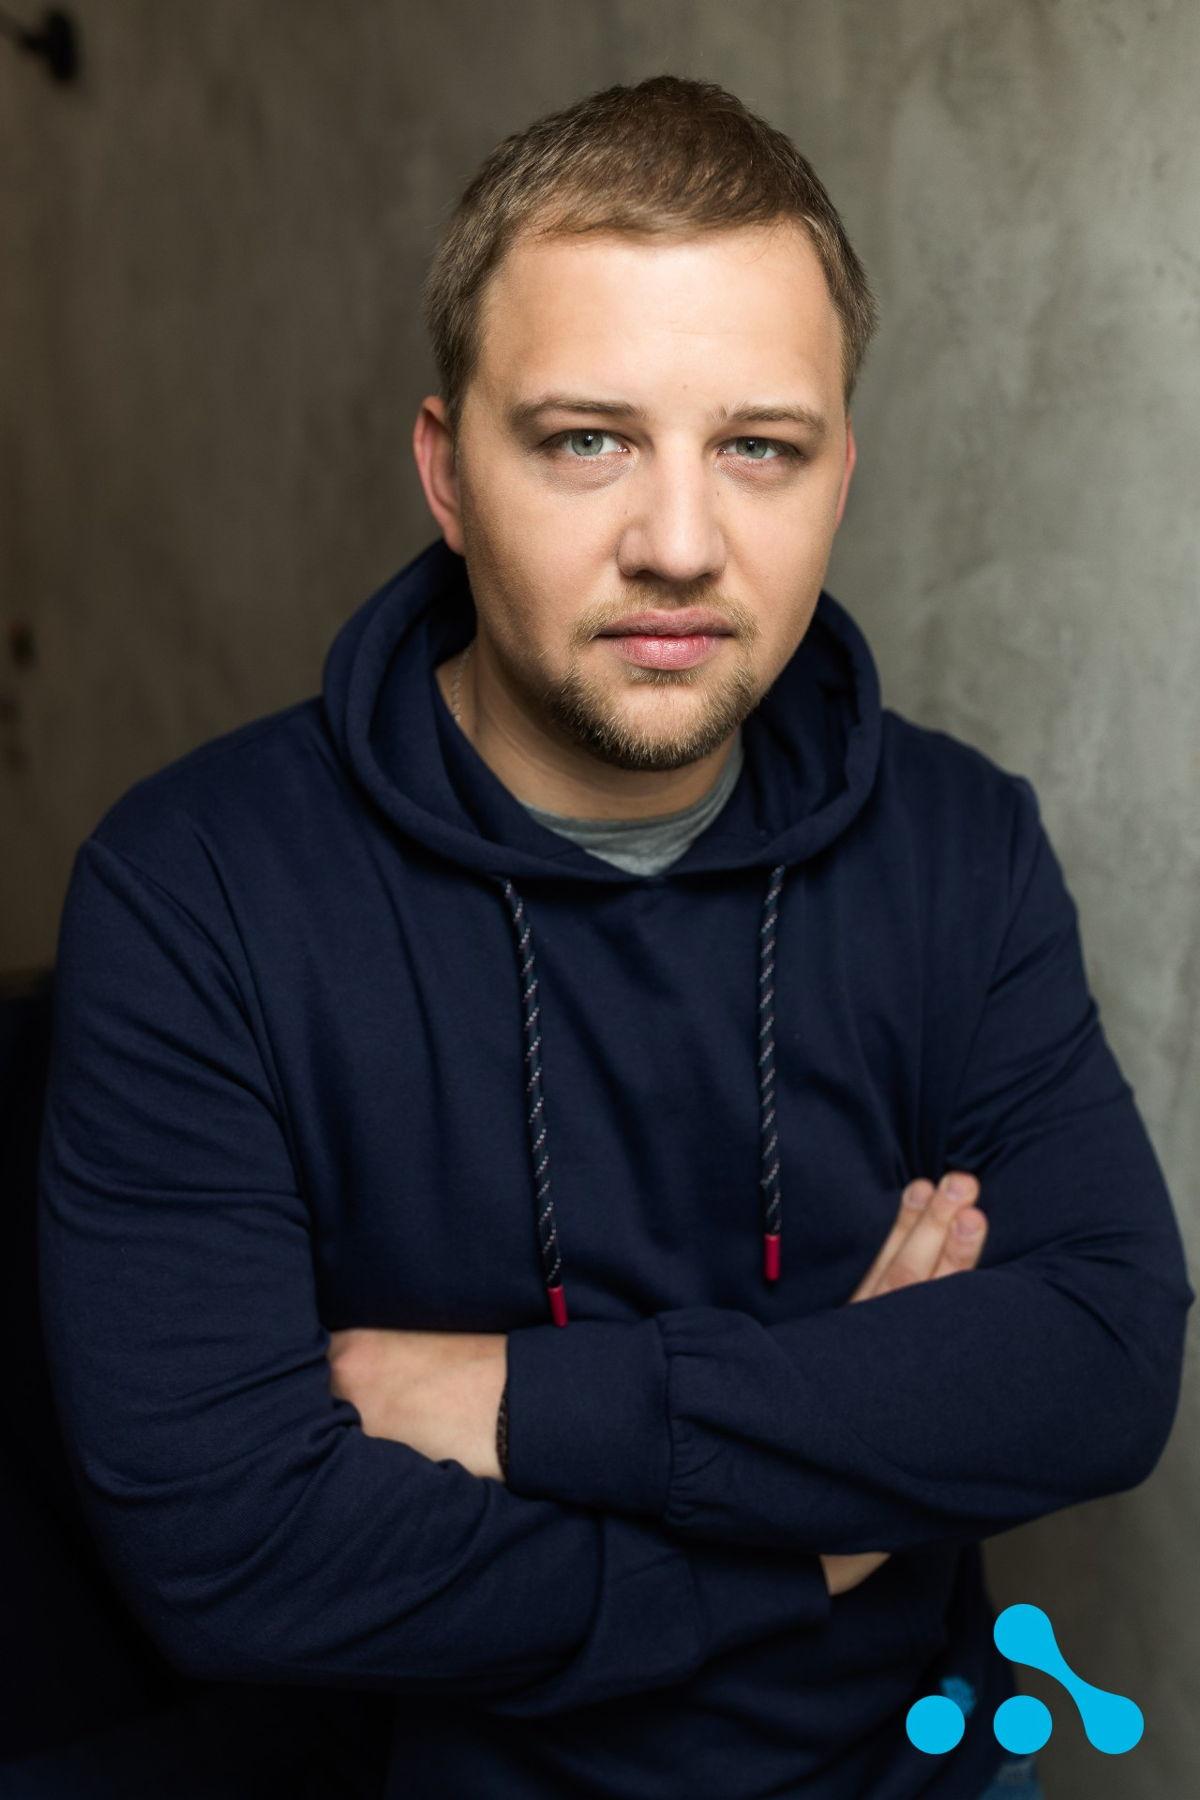 Евгений «Hitras» Шепелев, руководитель отдела киберспорта WePlay Esports. Фото предоставлено WePlay Esports